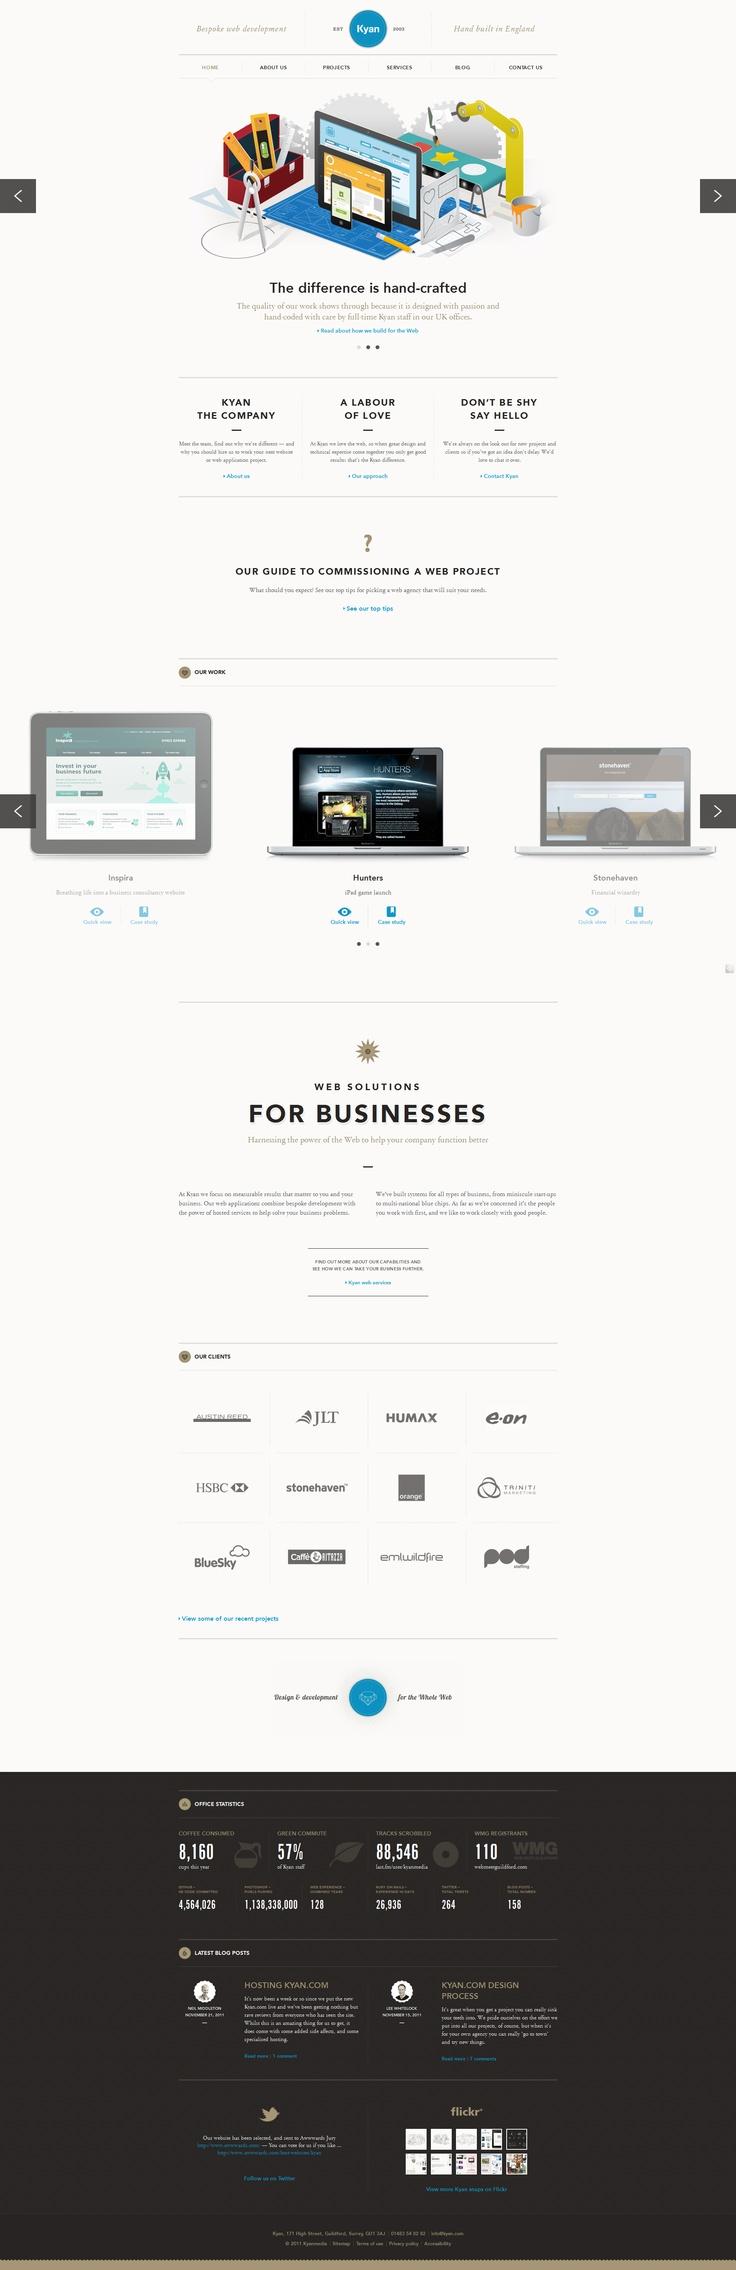 Just beautiful web design.